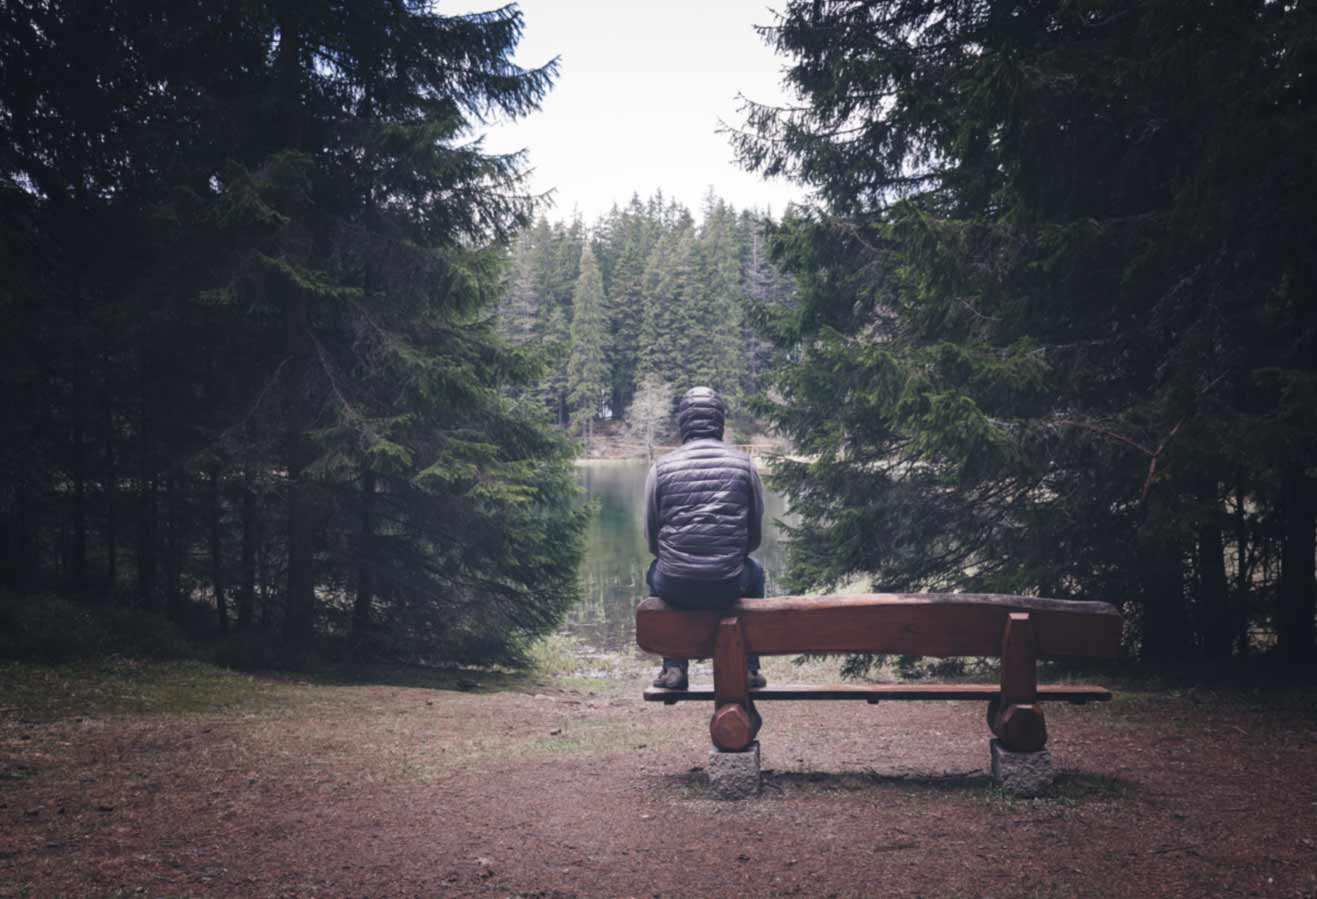 Sad man sitting alone on bench